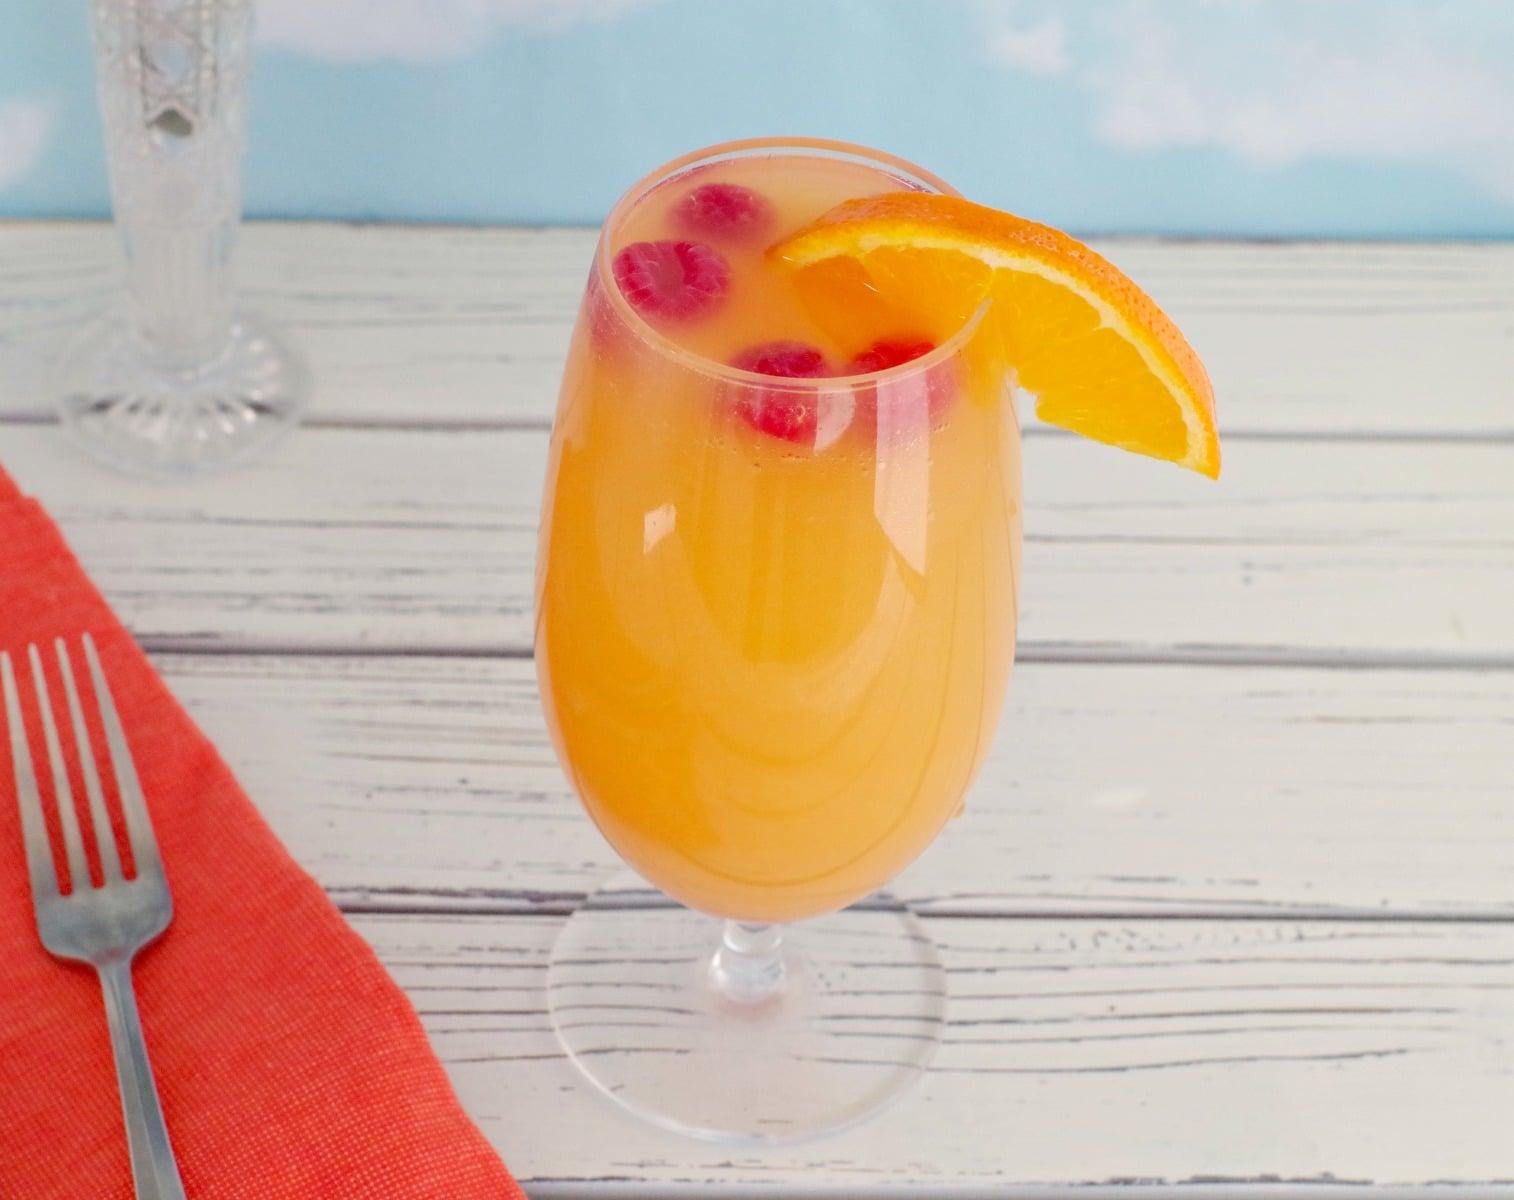 mimosa drink with raspberries and orange garnish